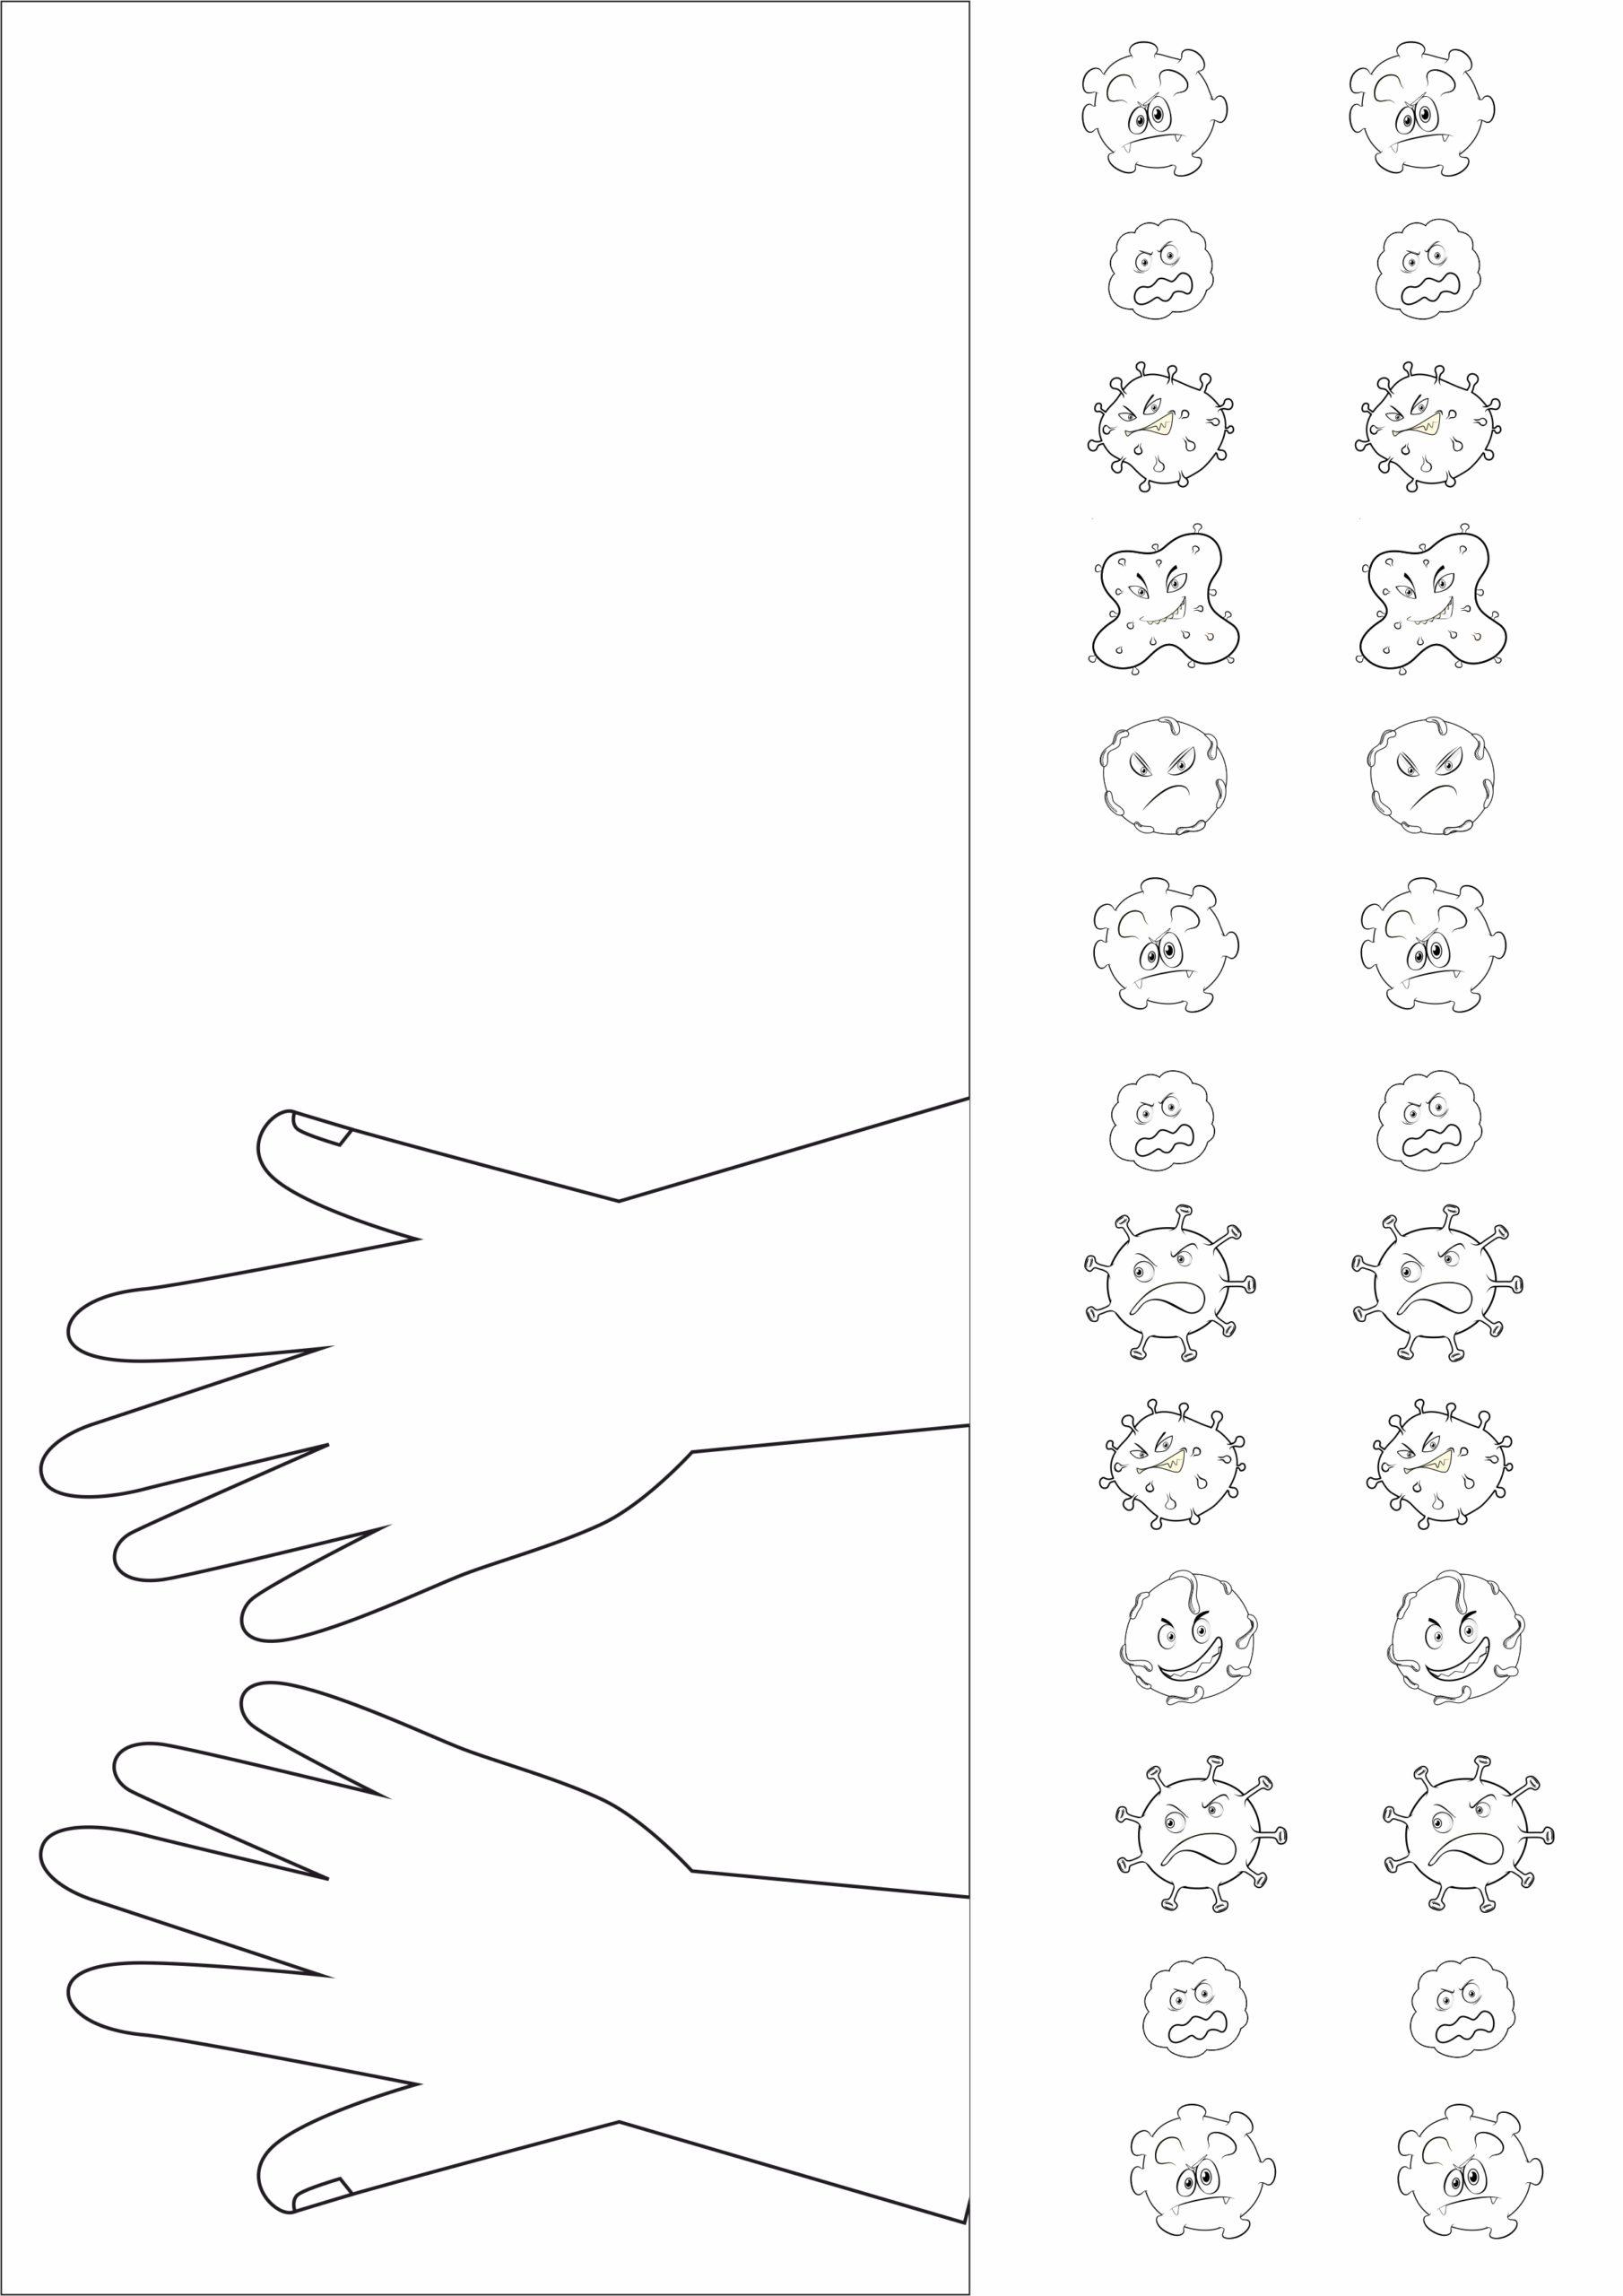 Шаблон «Чистые руки»